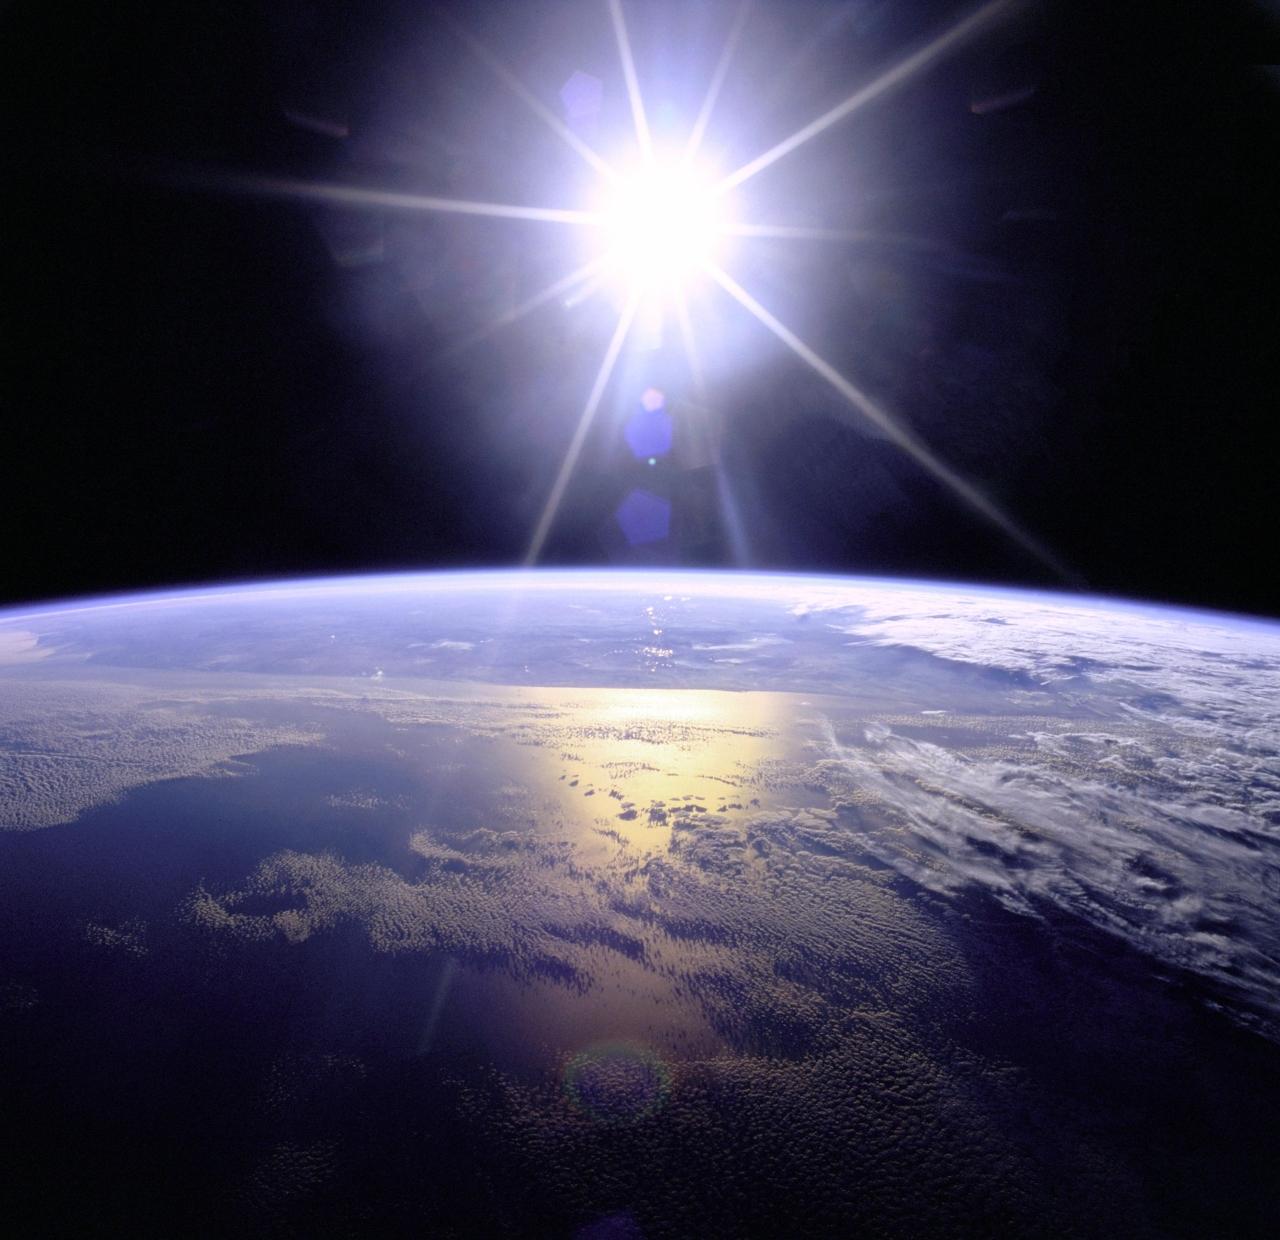 Sunburst over the Earth. (Image Credits: NASA)